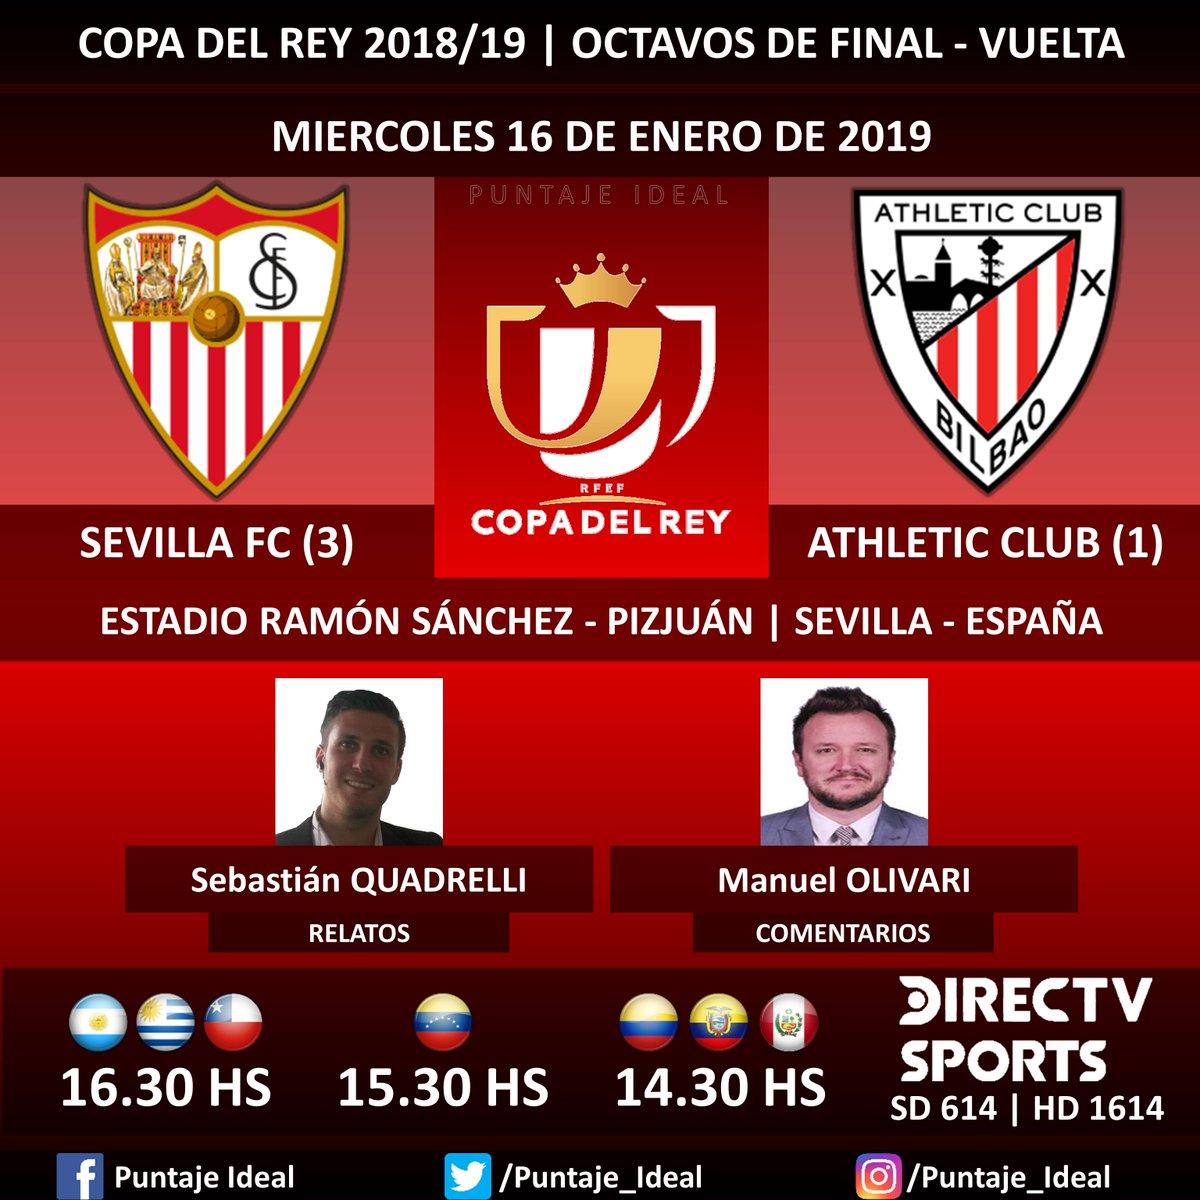 ⚽ #FútbolEnDIRECTV   #SevillaFC vs. #AthleticClub 🎙 Relatos: @SebaQuadrelli  🎙 Comentarios: @ManuOlivari  📺 TV: @DIRECTVSports Sudamérica (614 - 1614 HD) - #Torneos 🤳 #SoySportista - #CopaDelRey 🇪🇸 - #SevillaAthletic  Dale RT 🔃